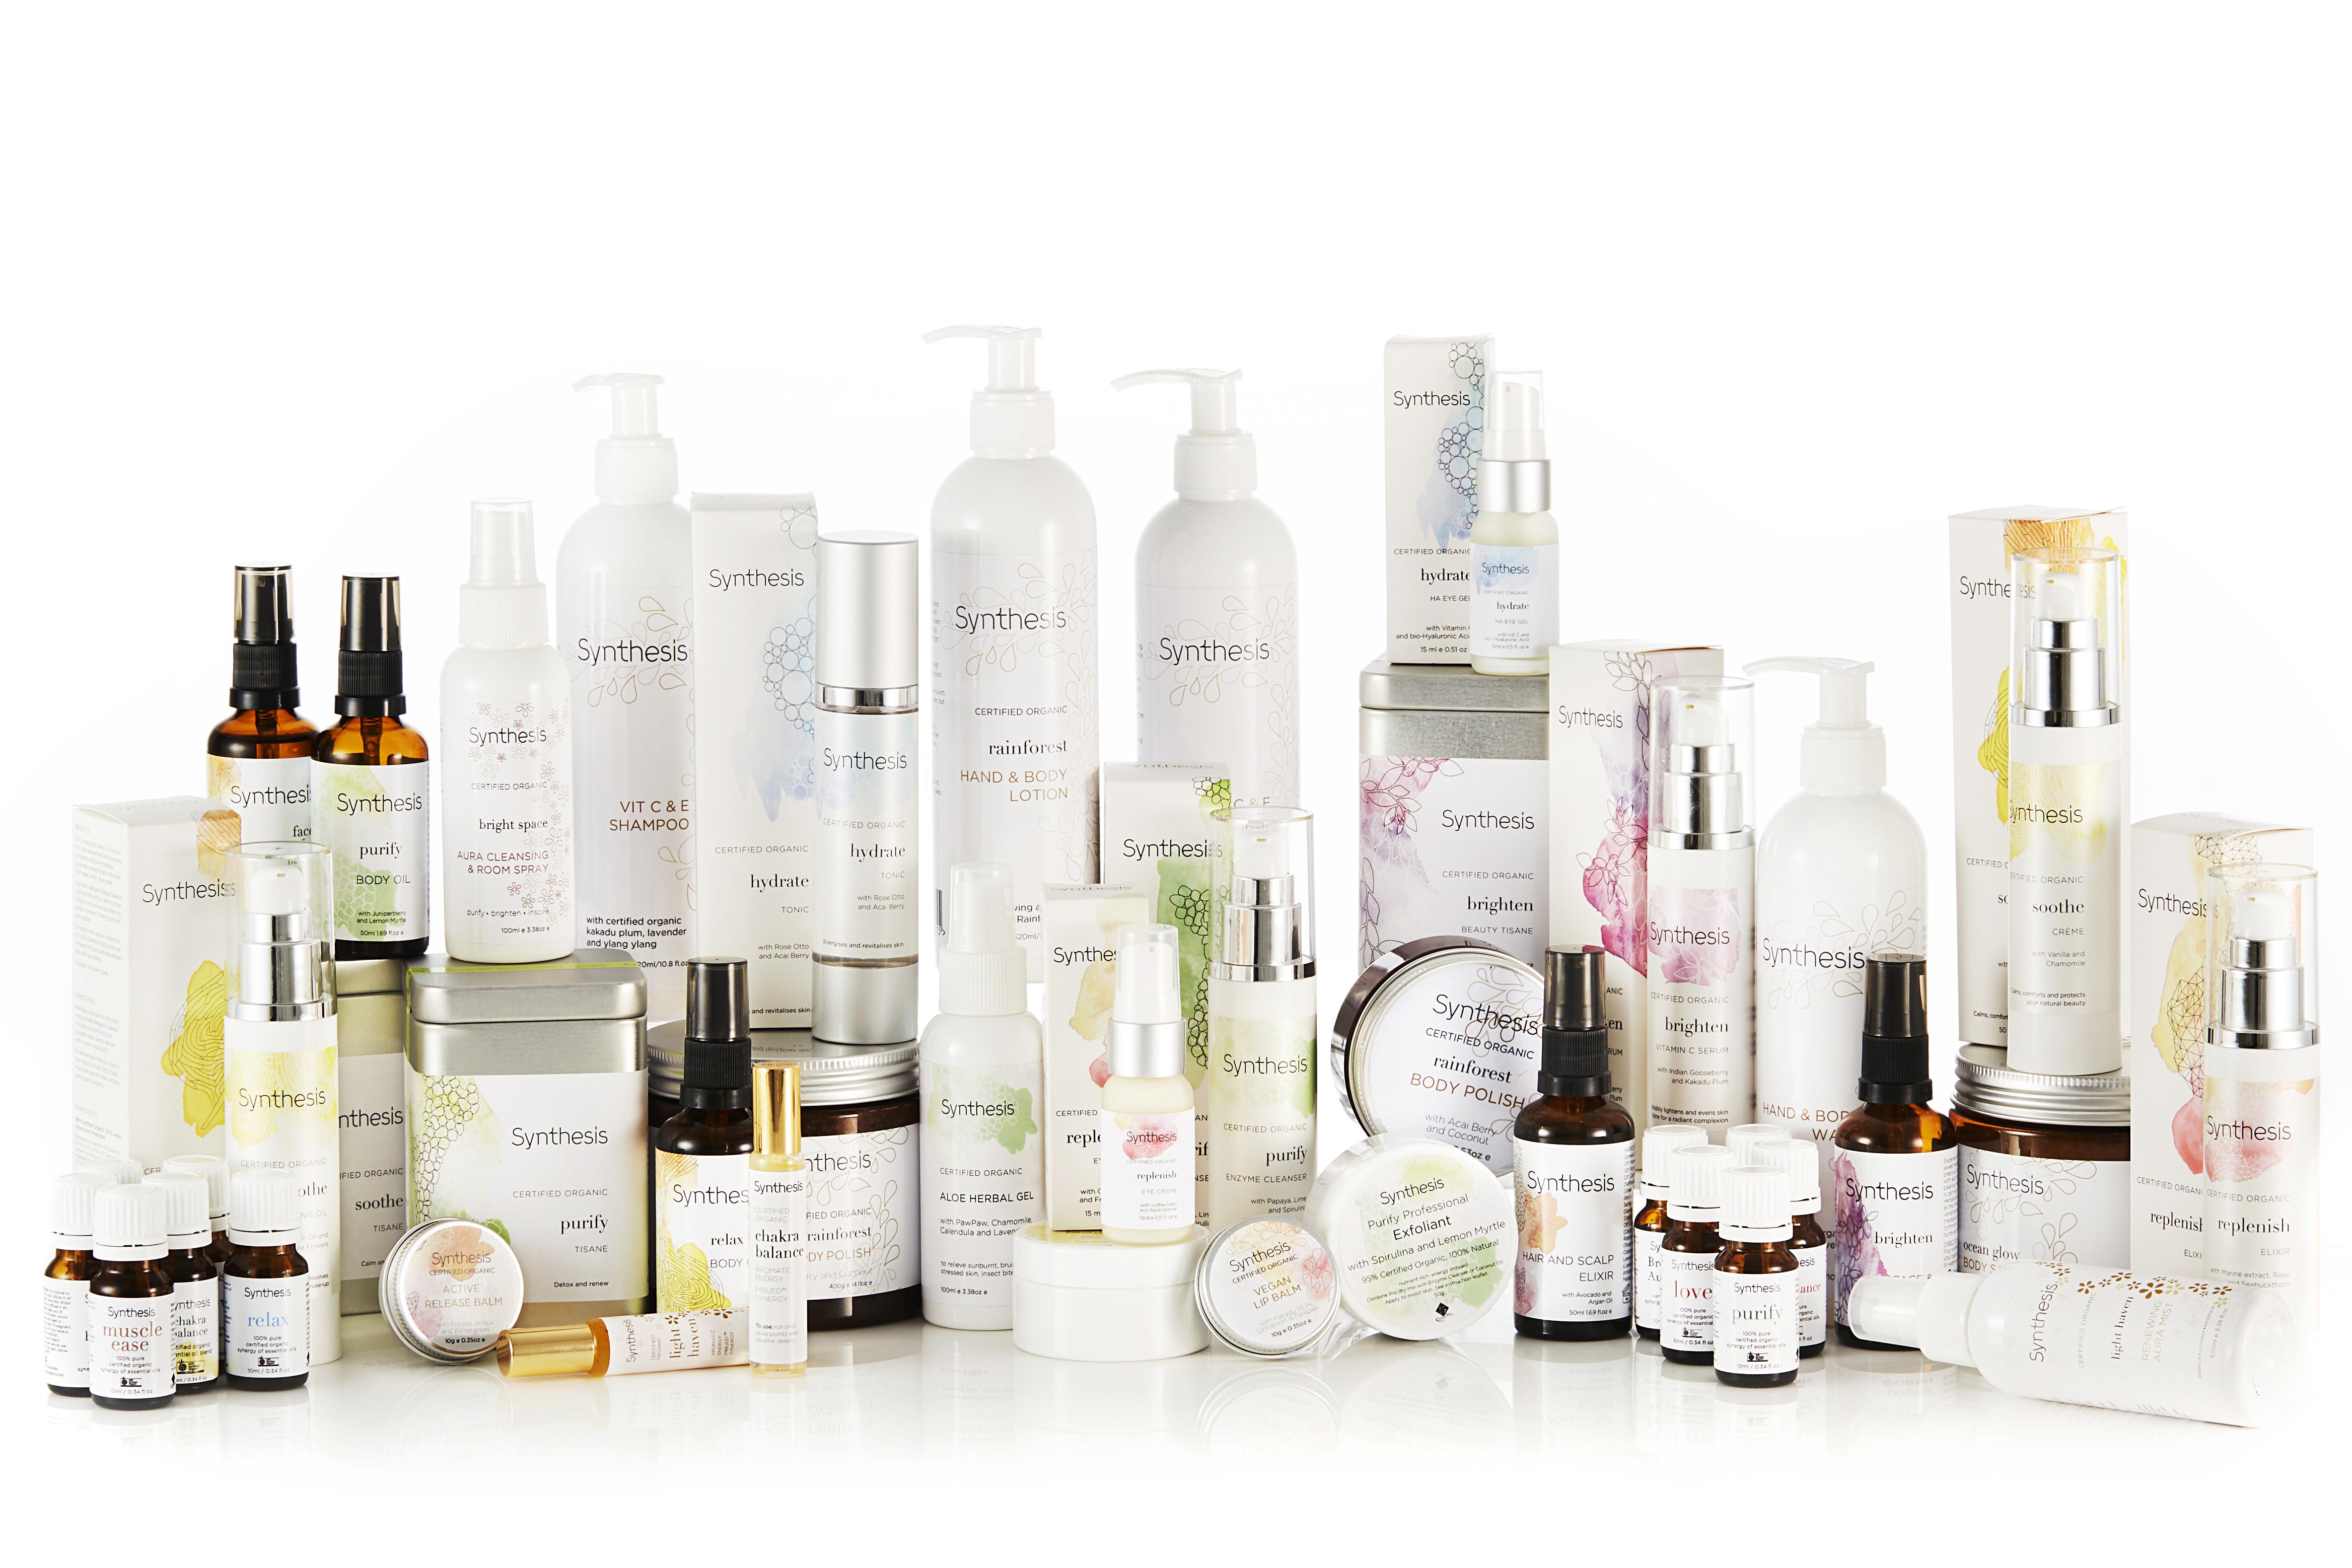 List of Vegan Skincare and Make up Brands